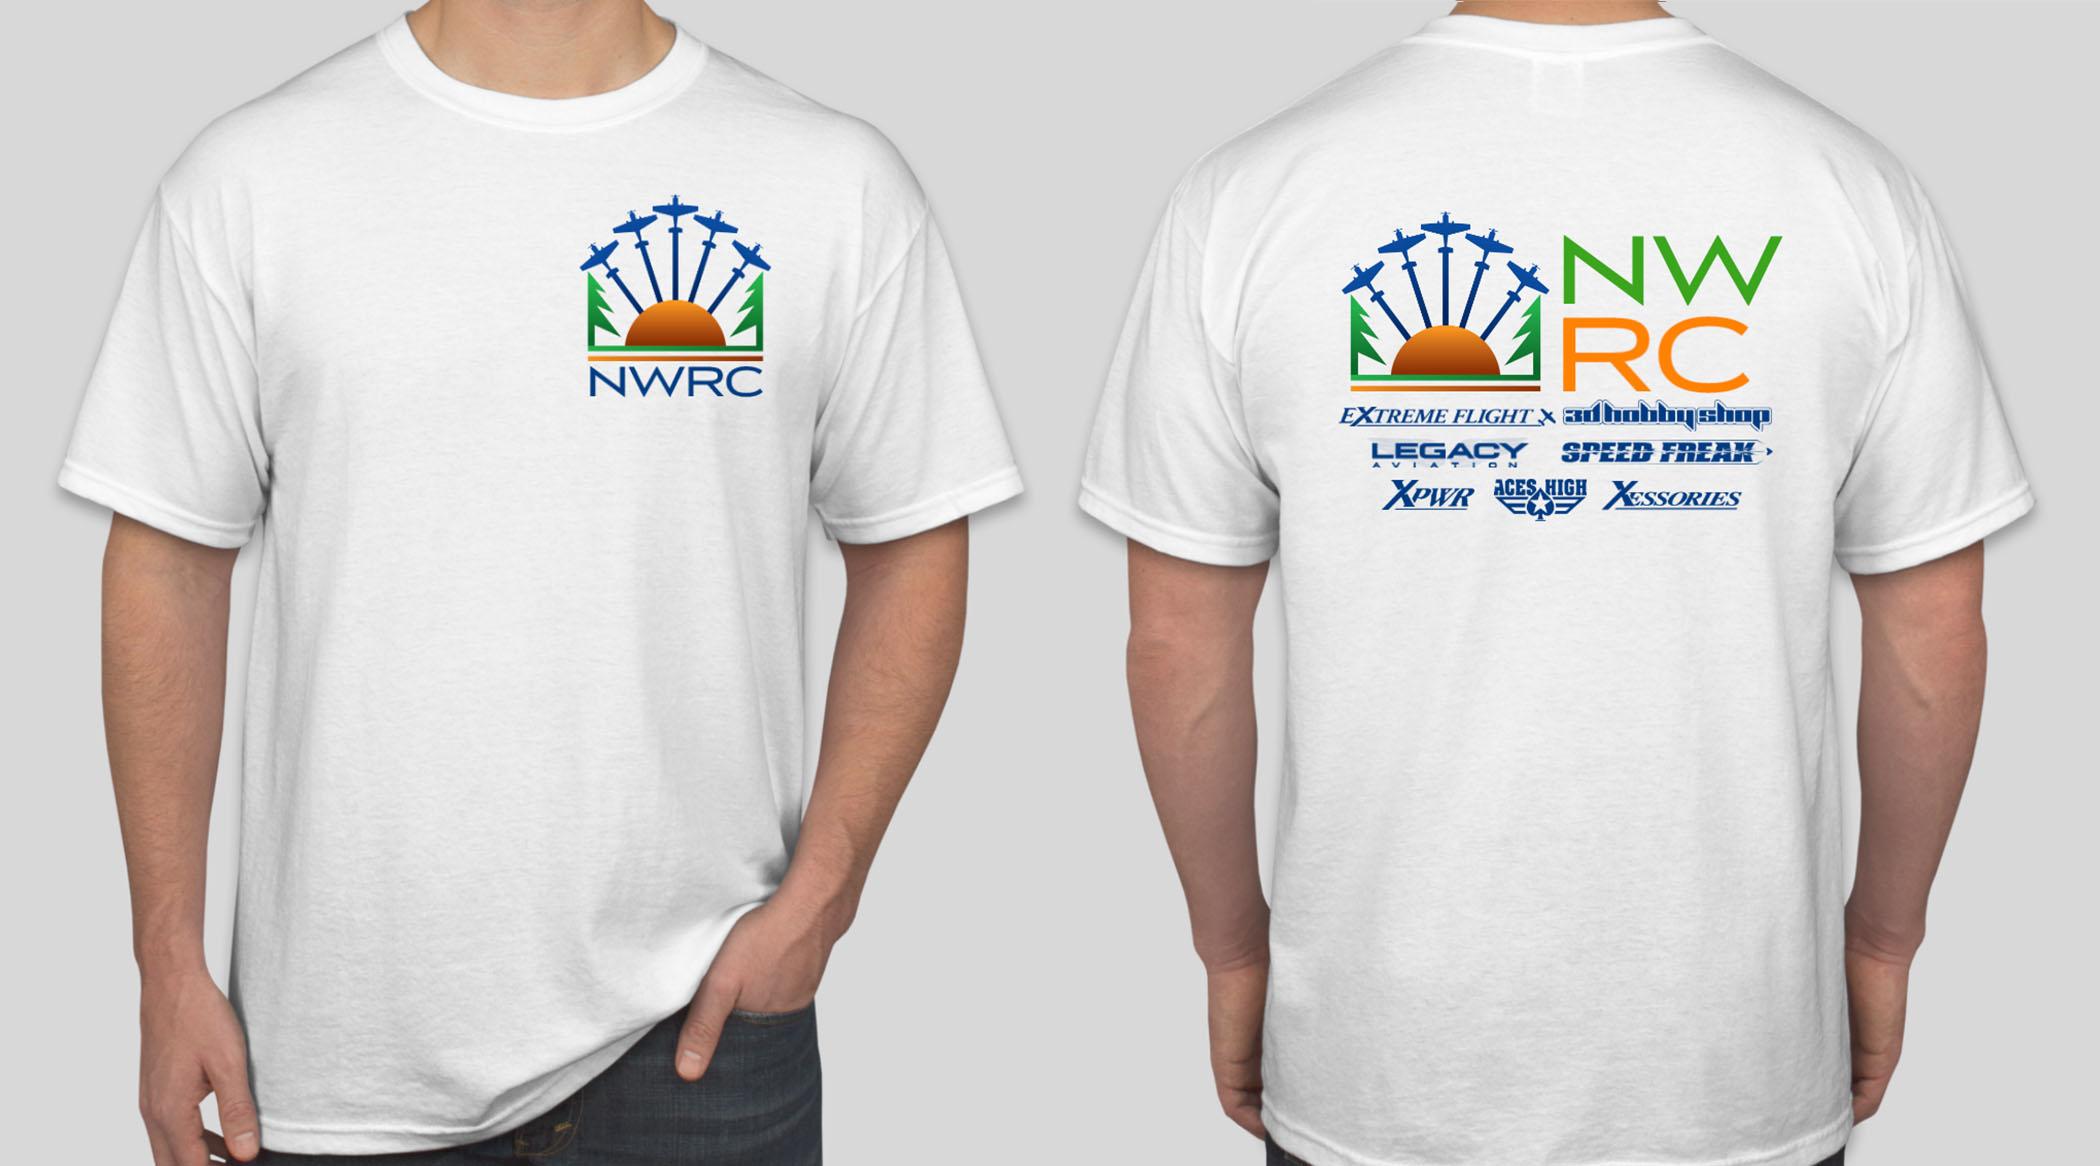 Nwrc t shirt white multi extra large for Extra tall white t shirts